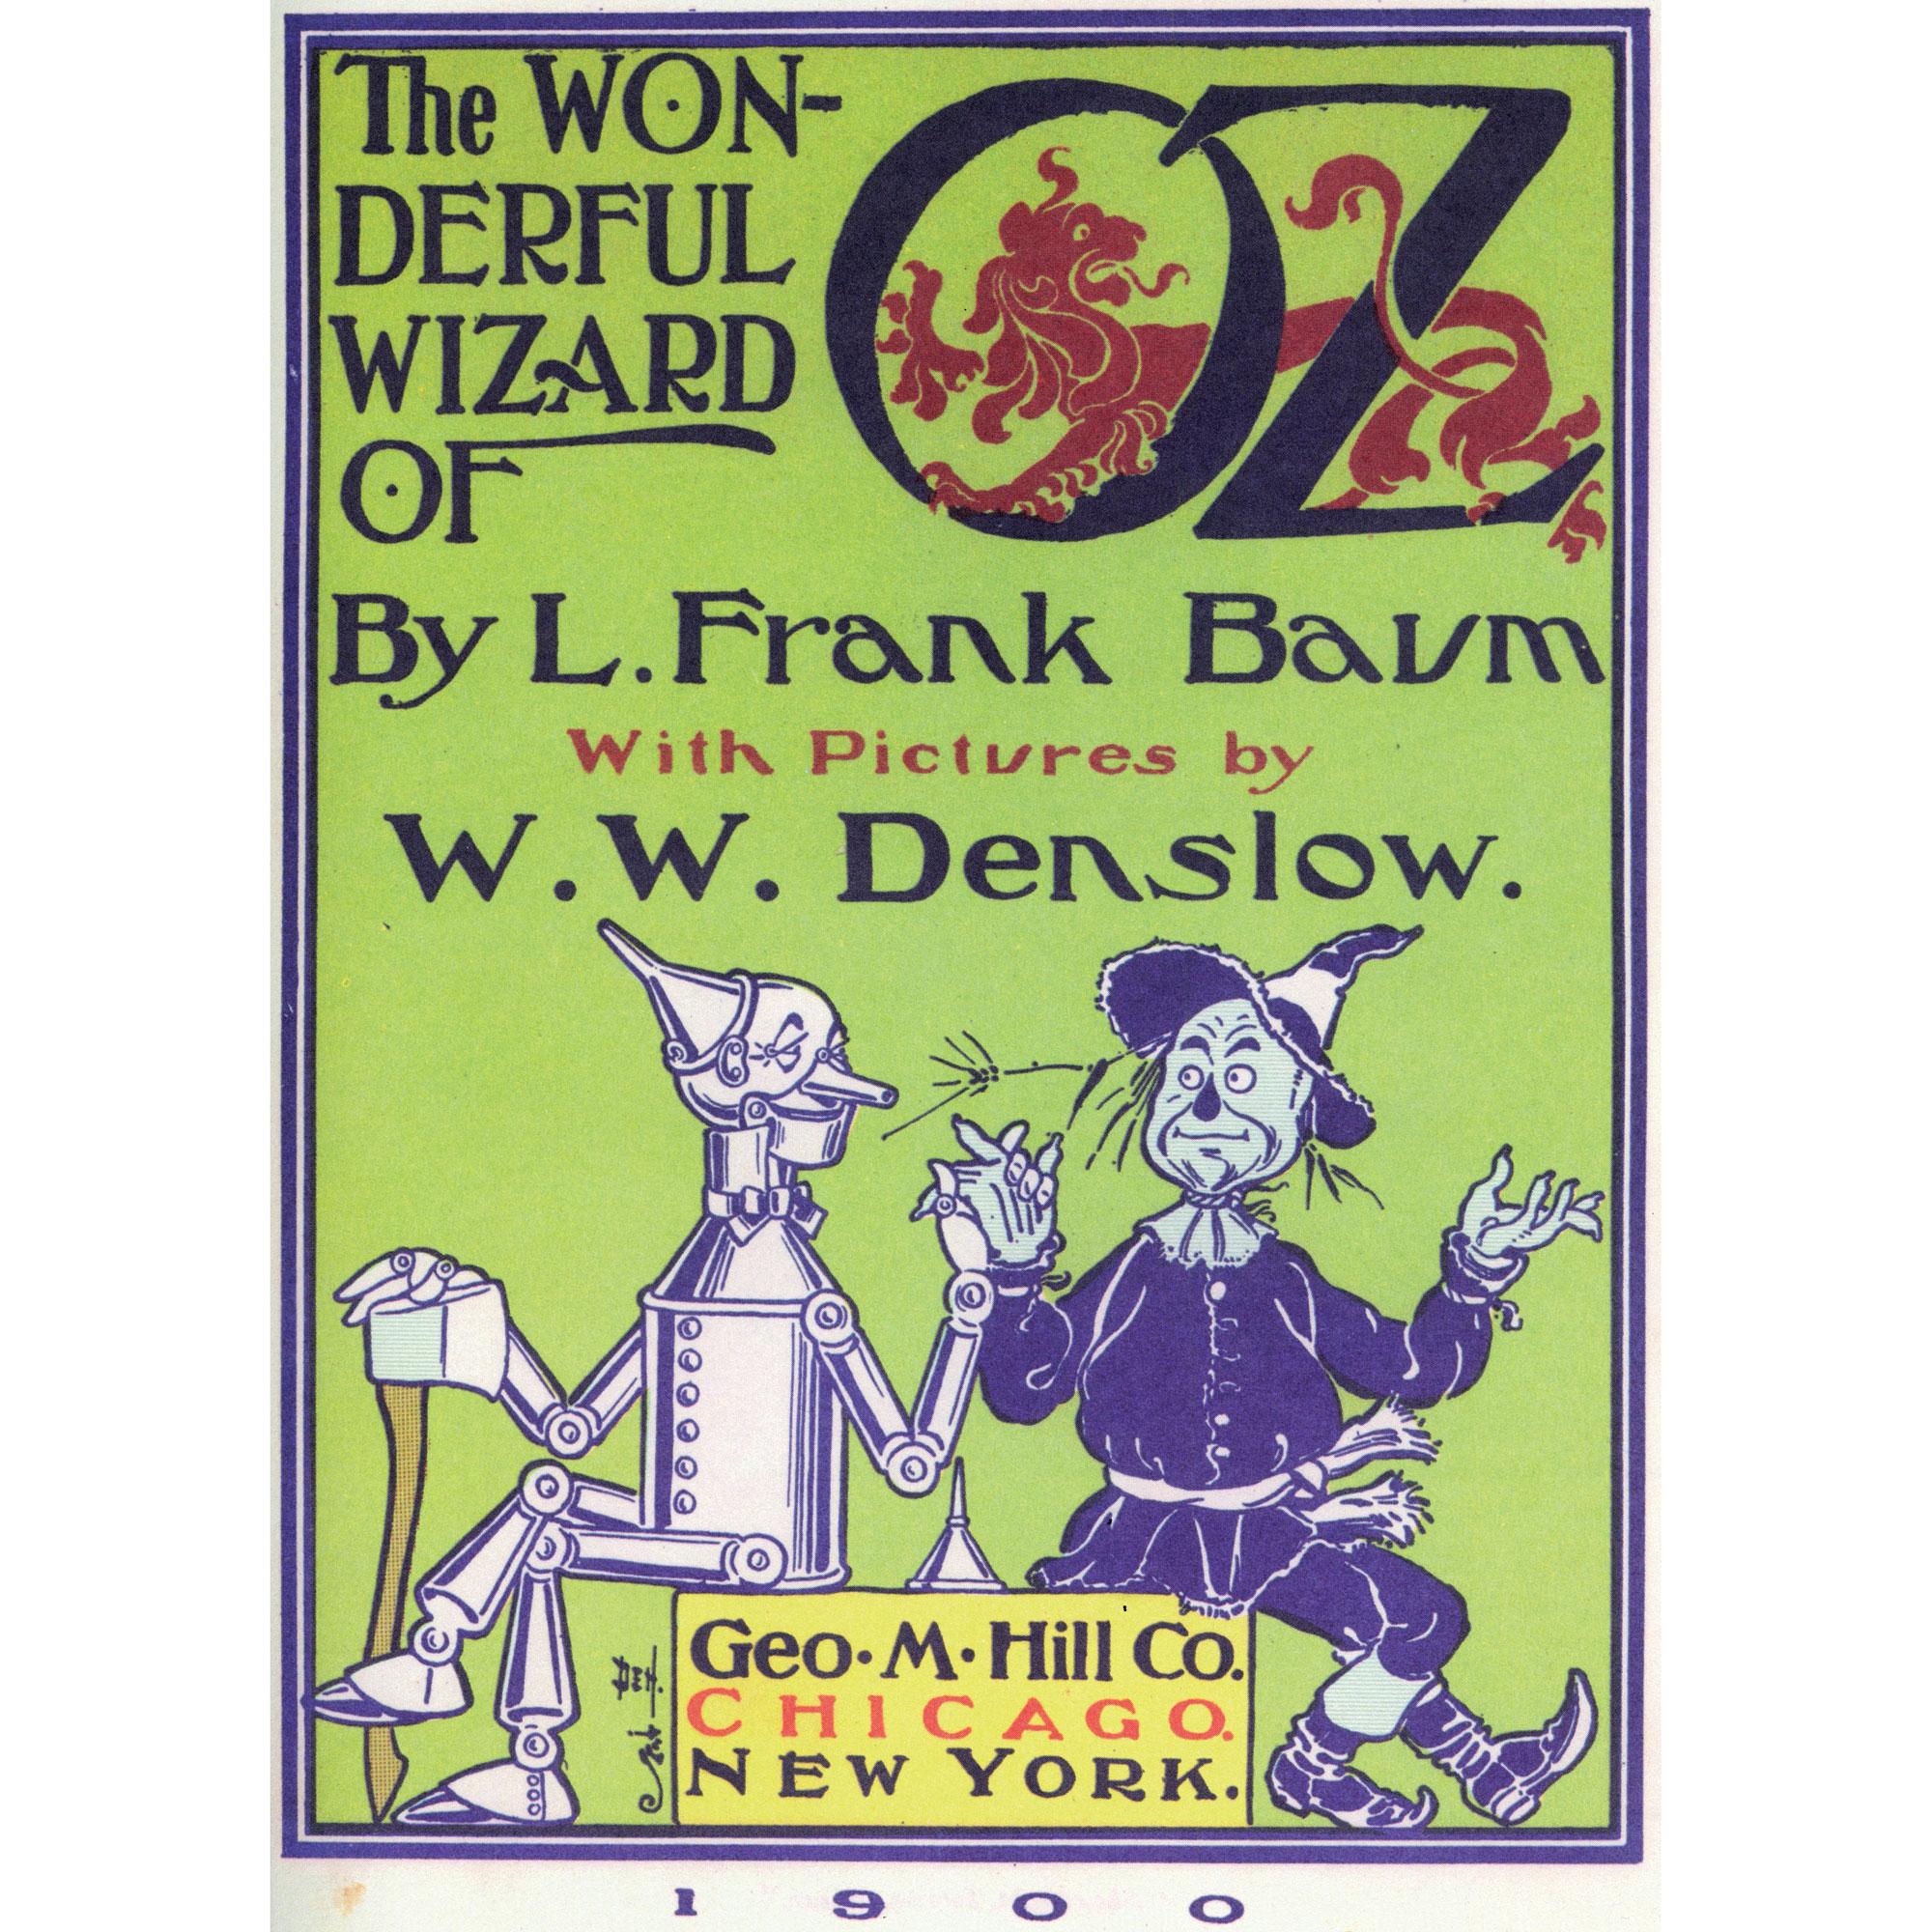 The Wonderful Wizard of Oz - Nov 12, 2011 – Apr 15, 2012